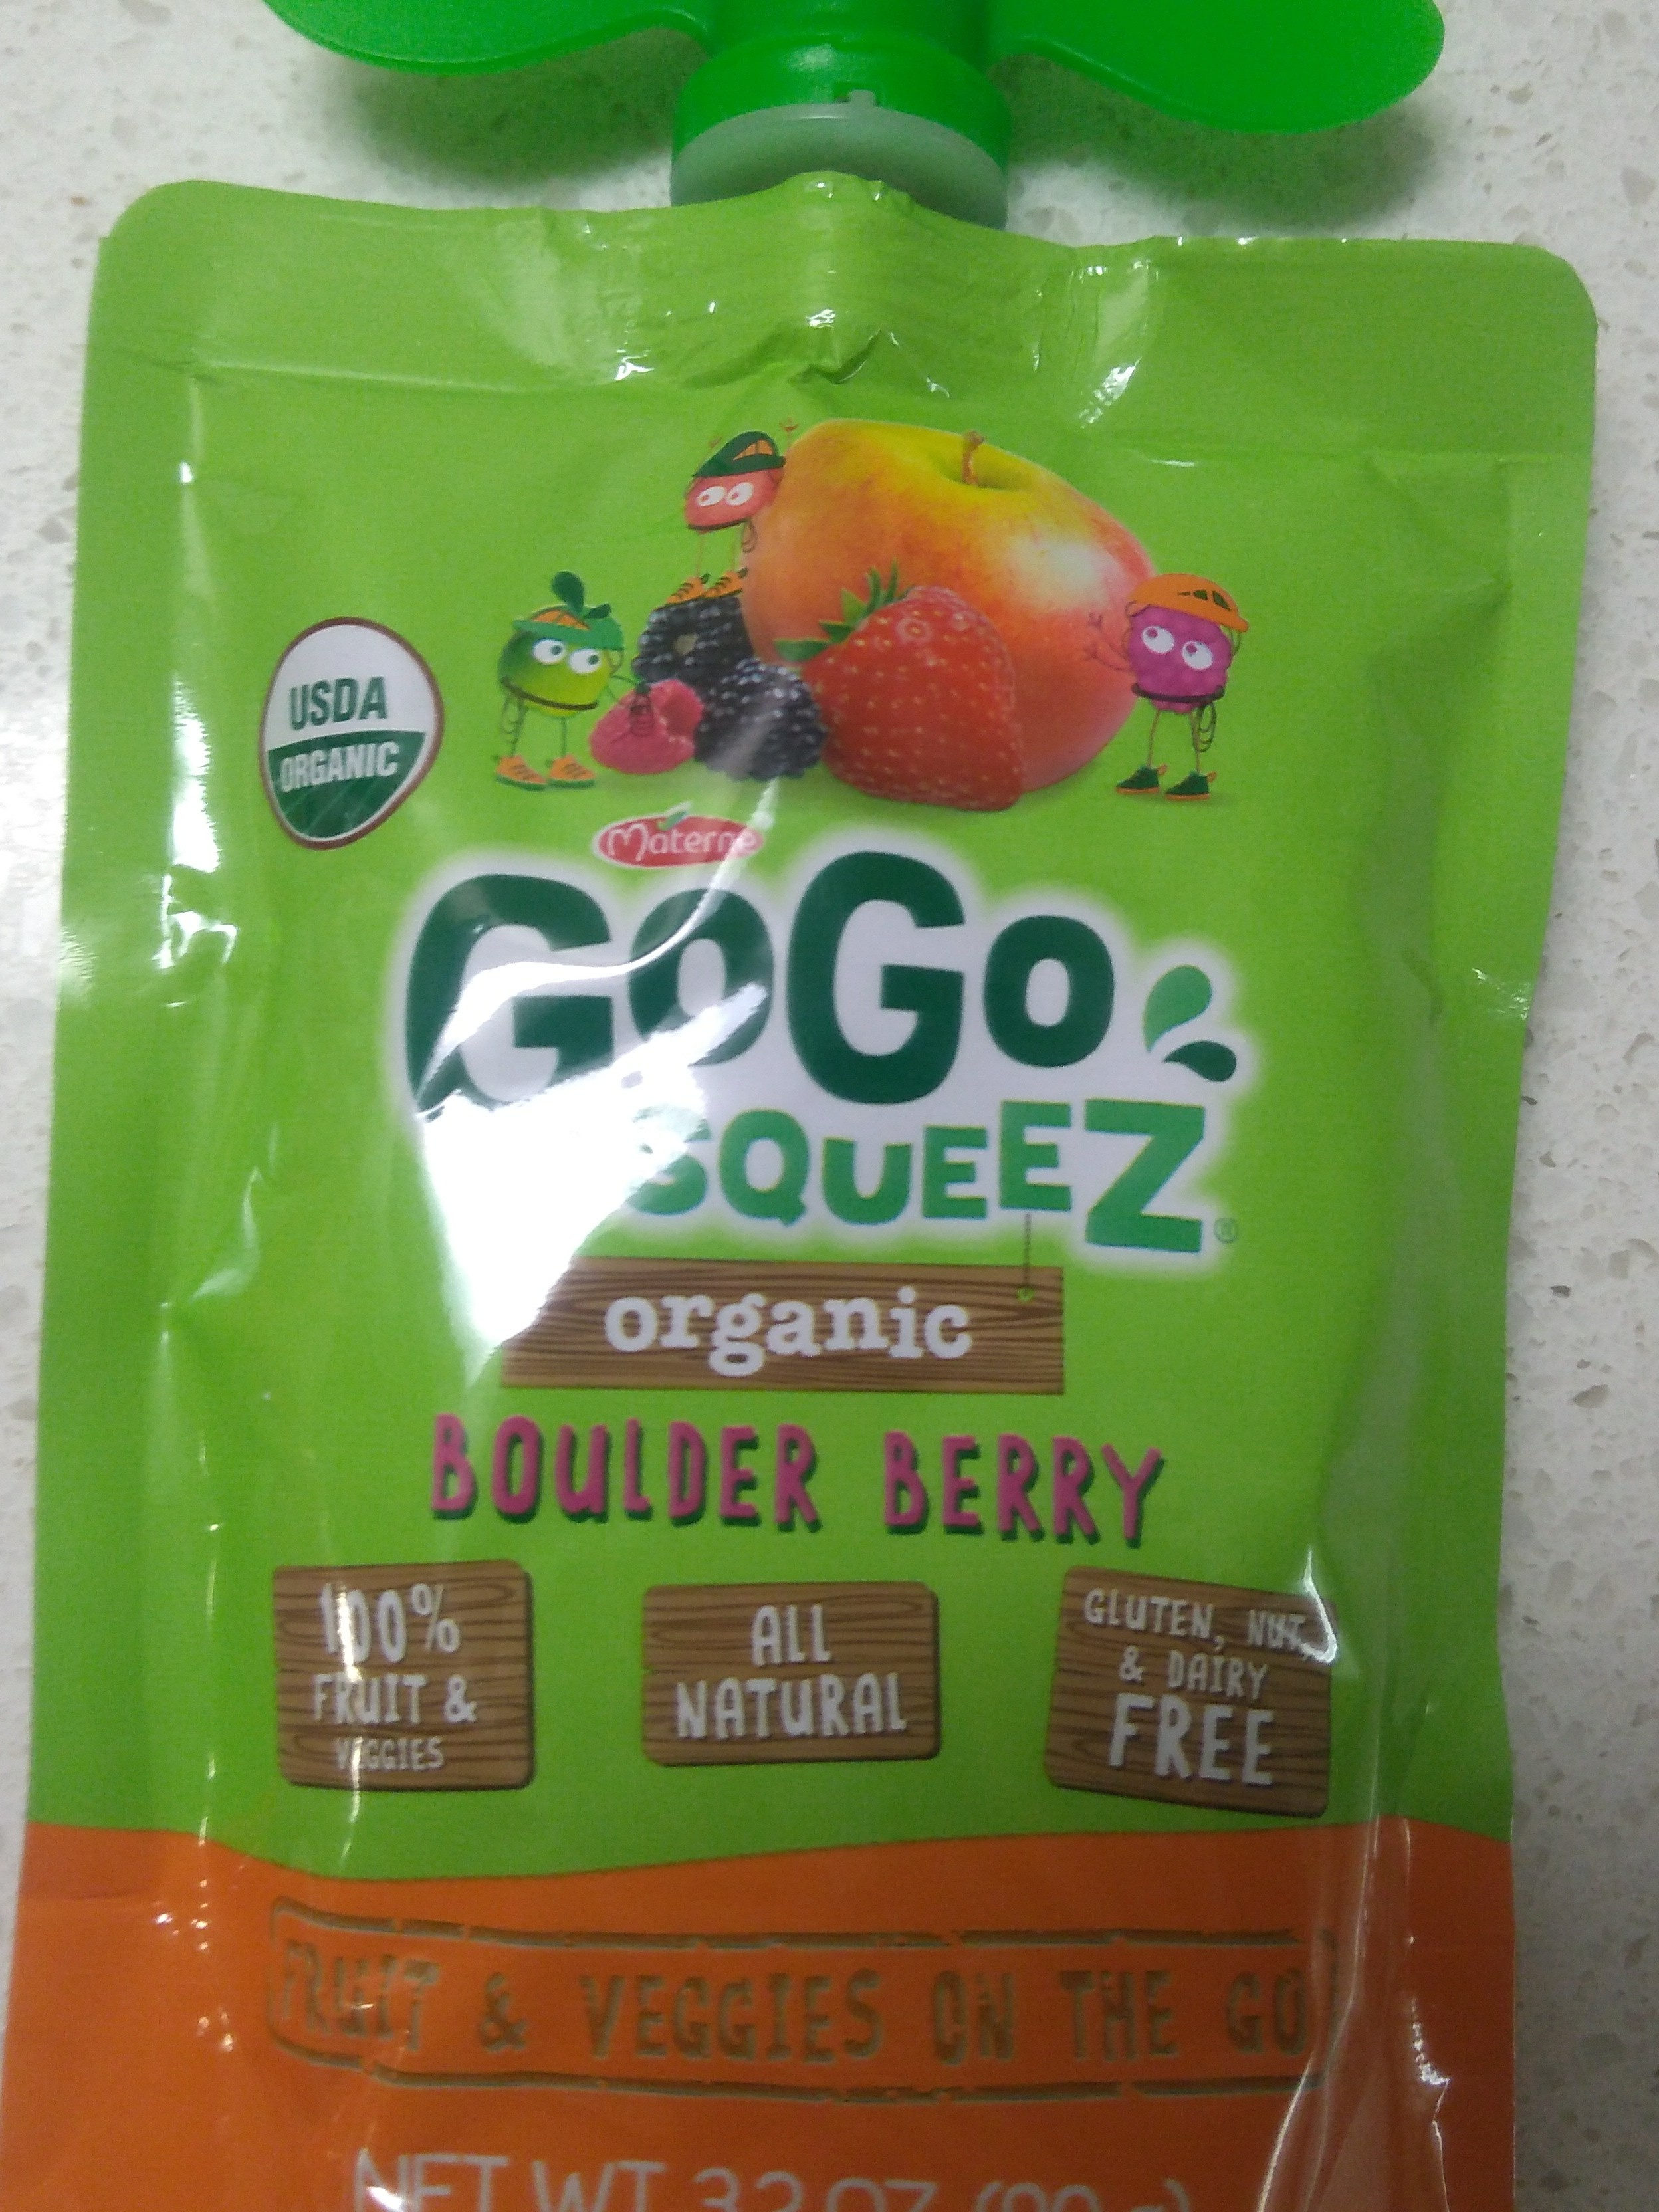 gogo squeez - Product - en